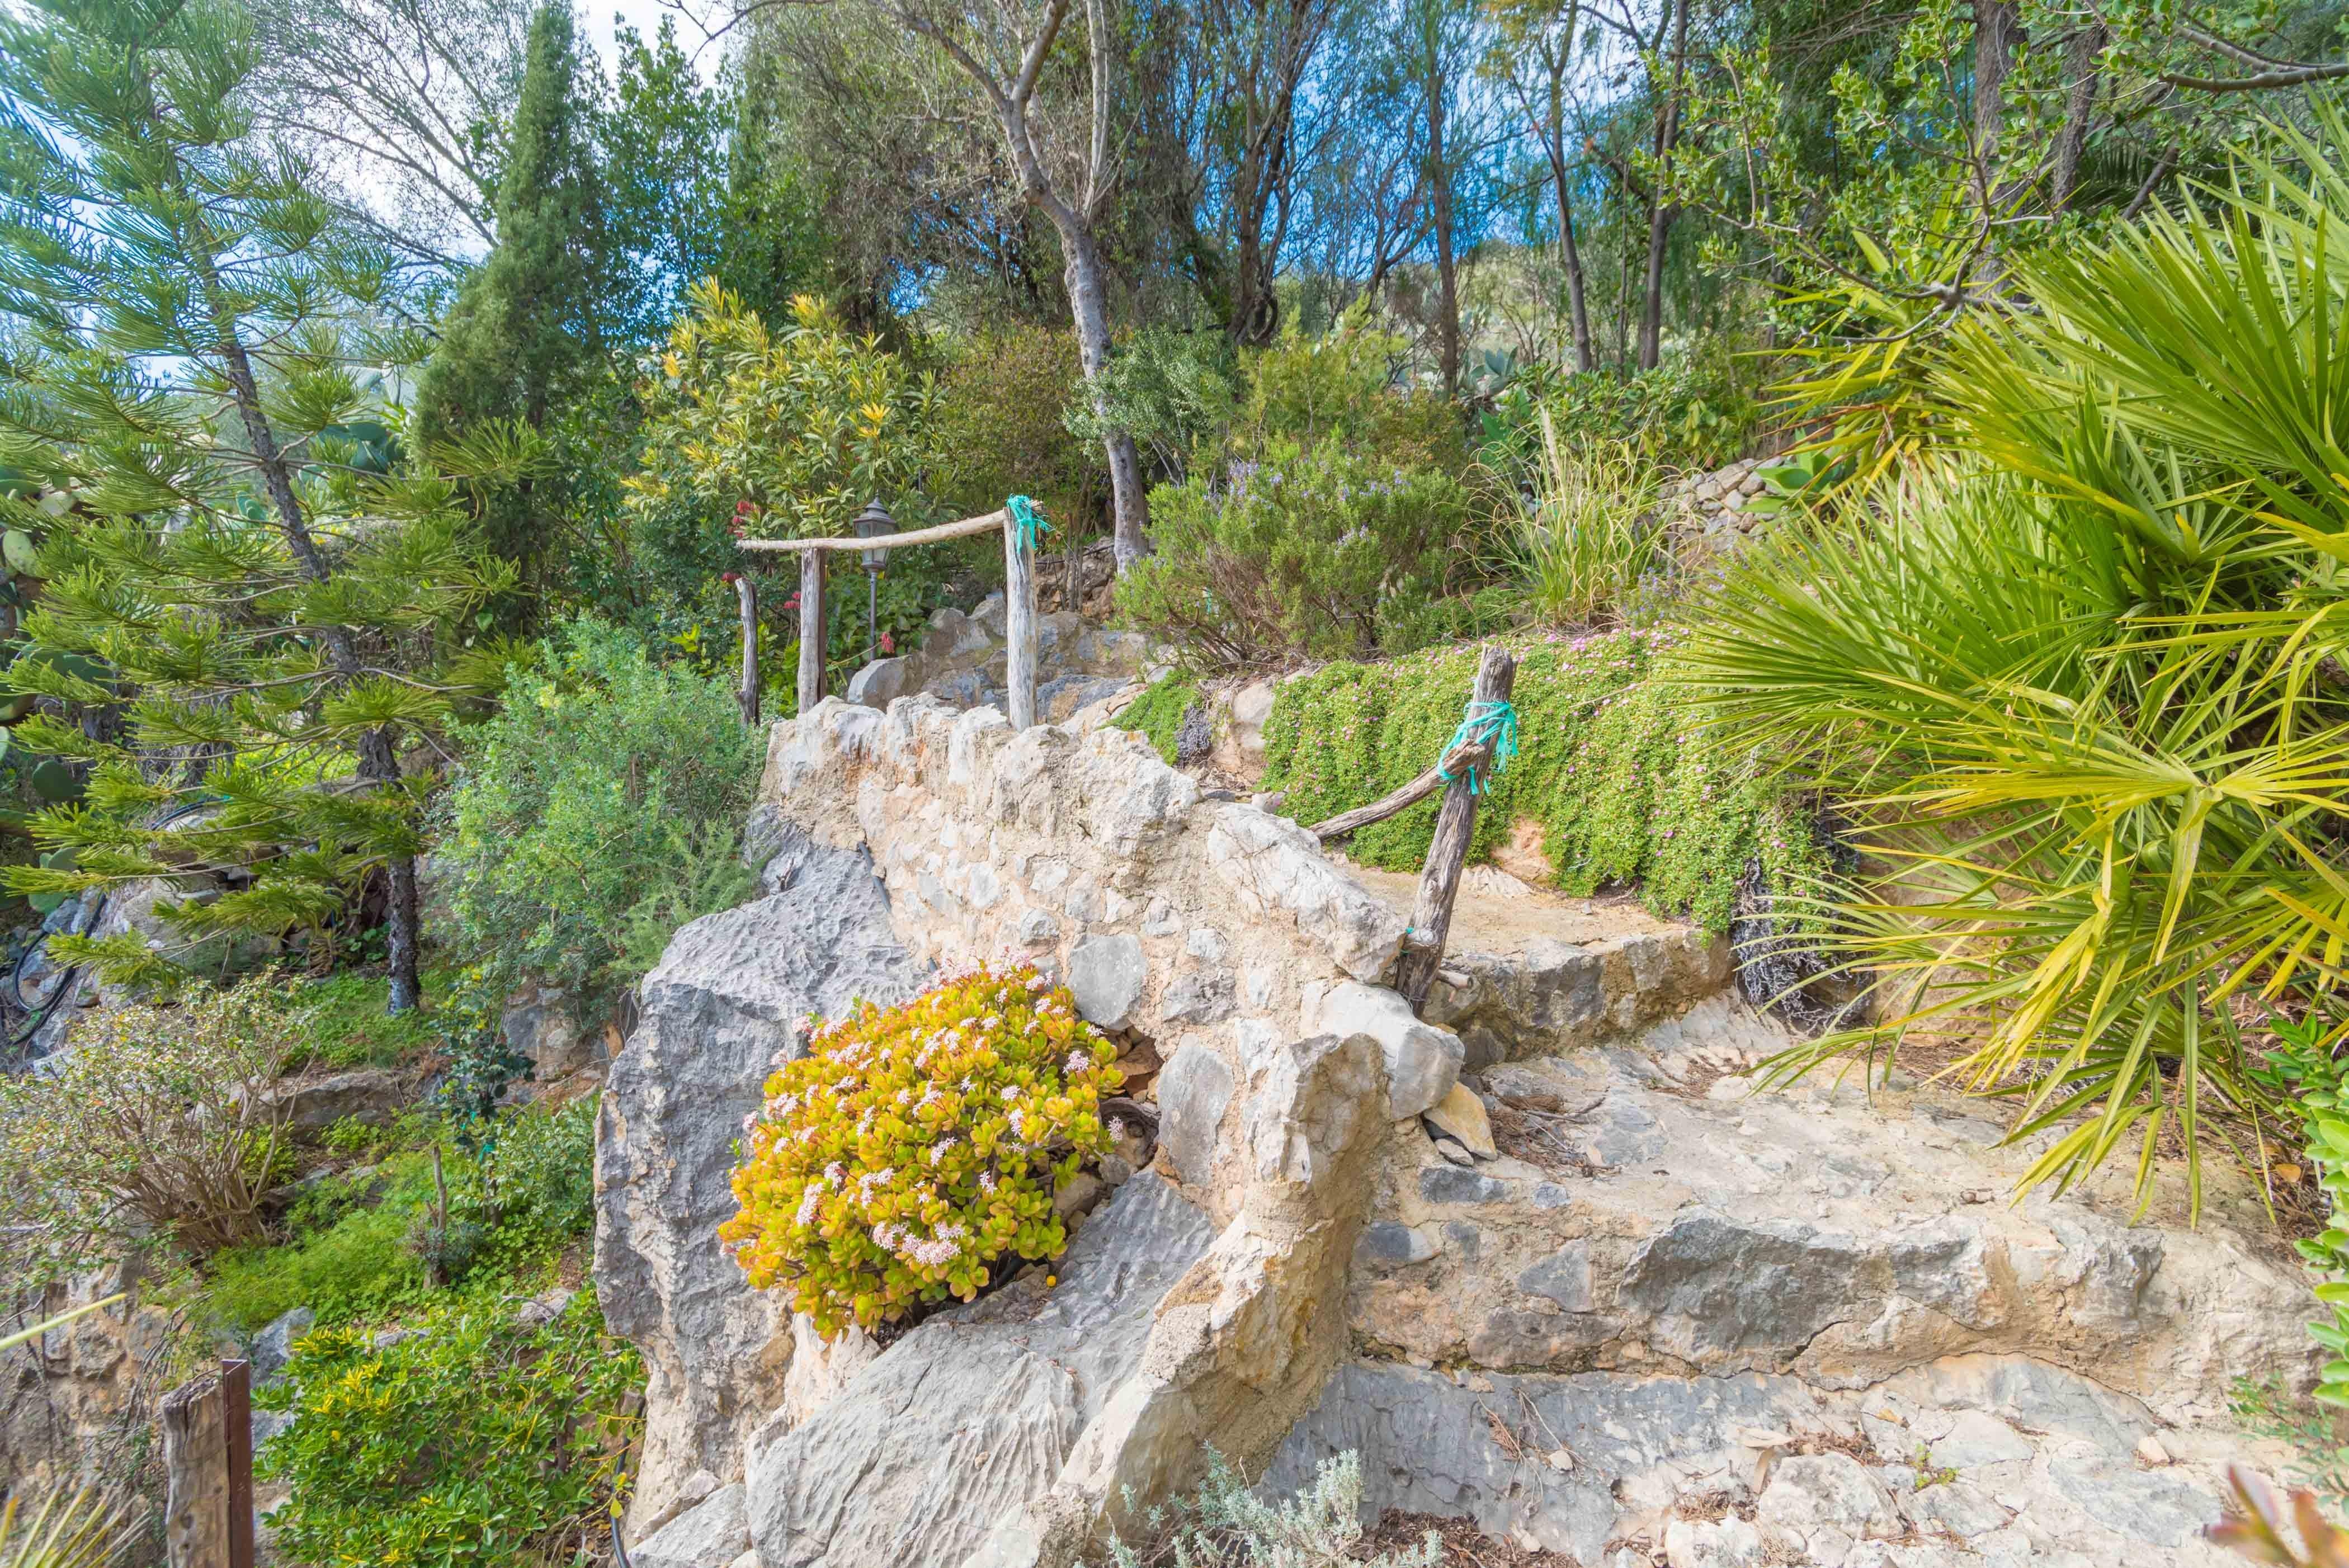 Maison de vacances CA NA CARME (ALARONERA) (2382858), Alaro, Majorque, Iles Baléares, Espagne, image 27